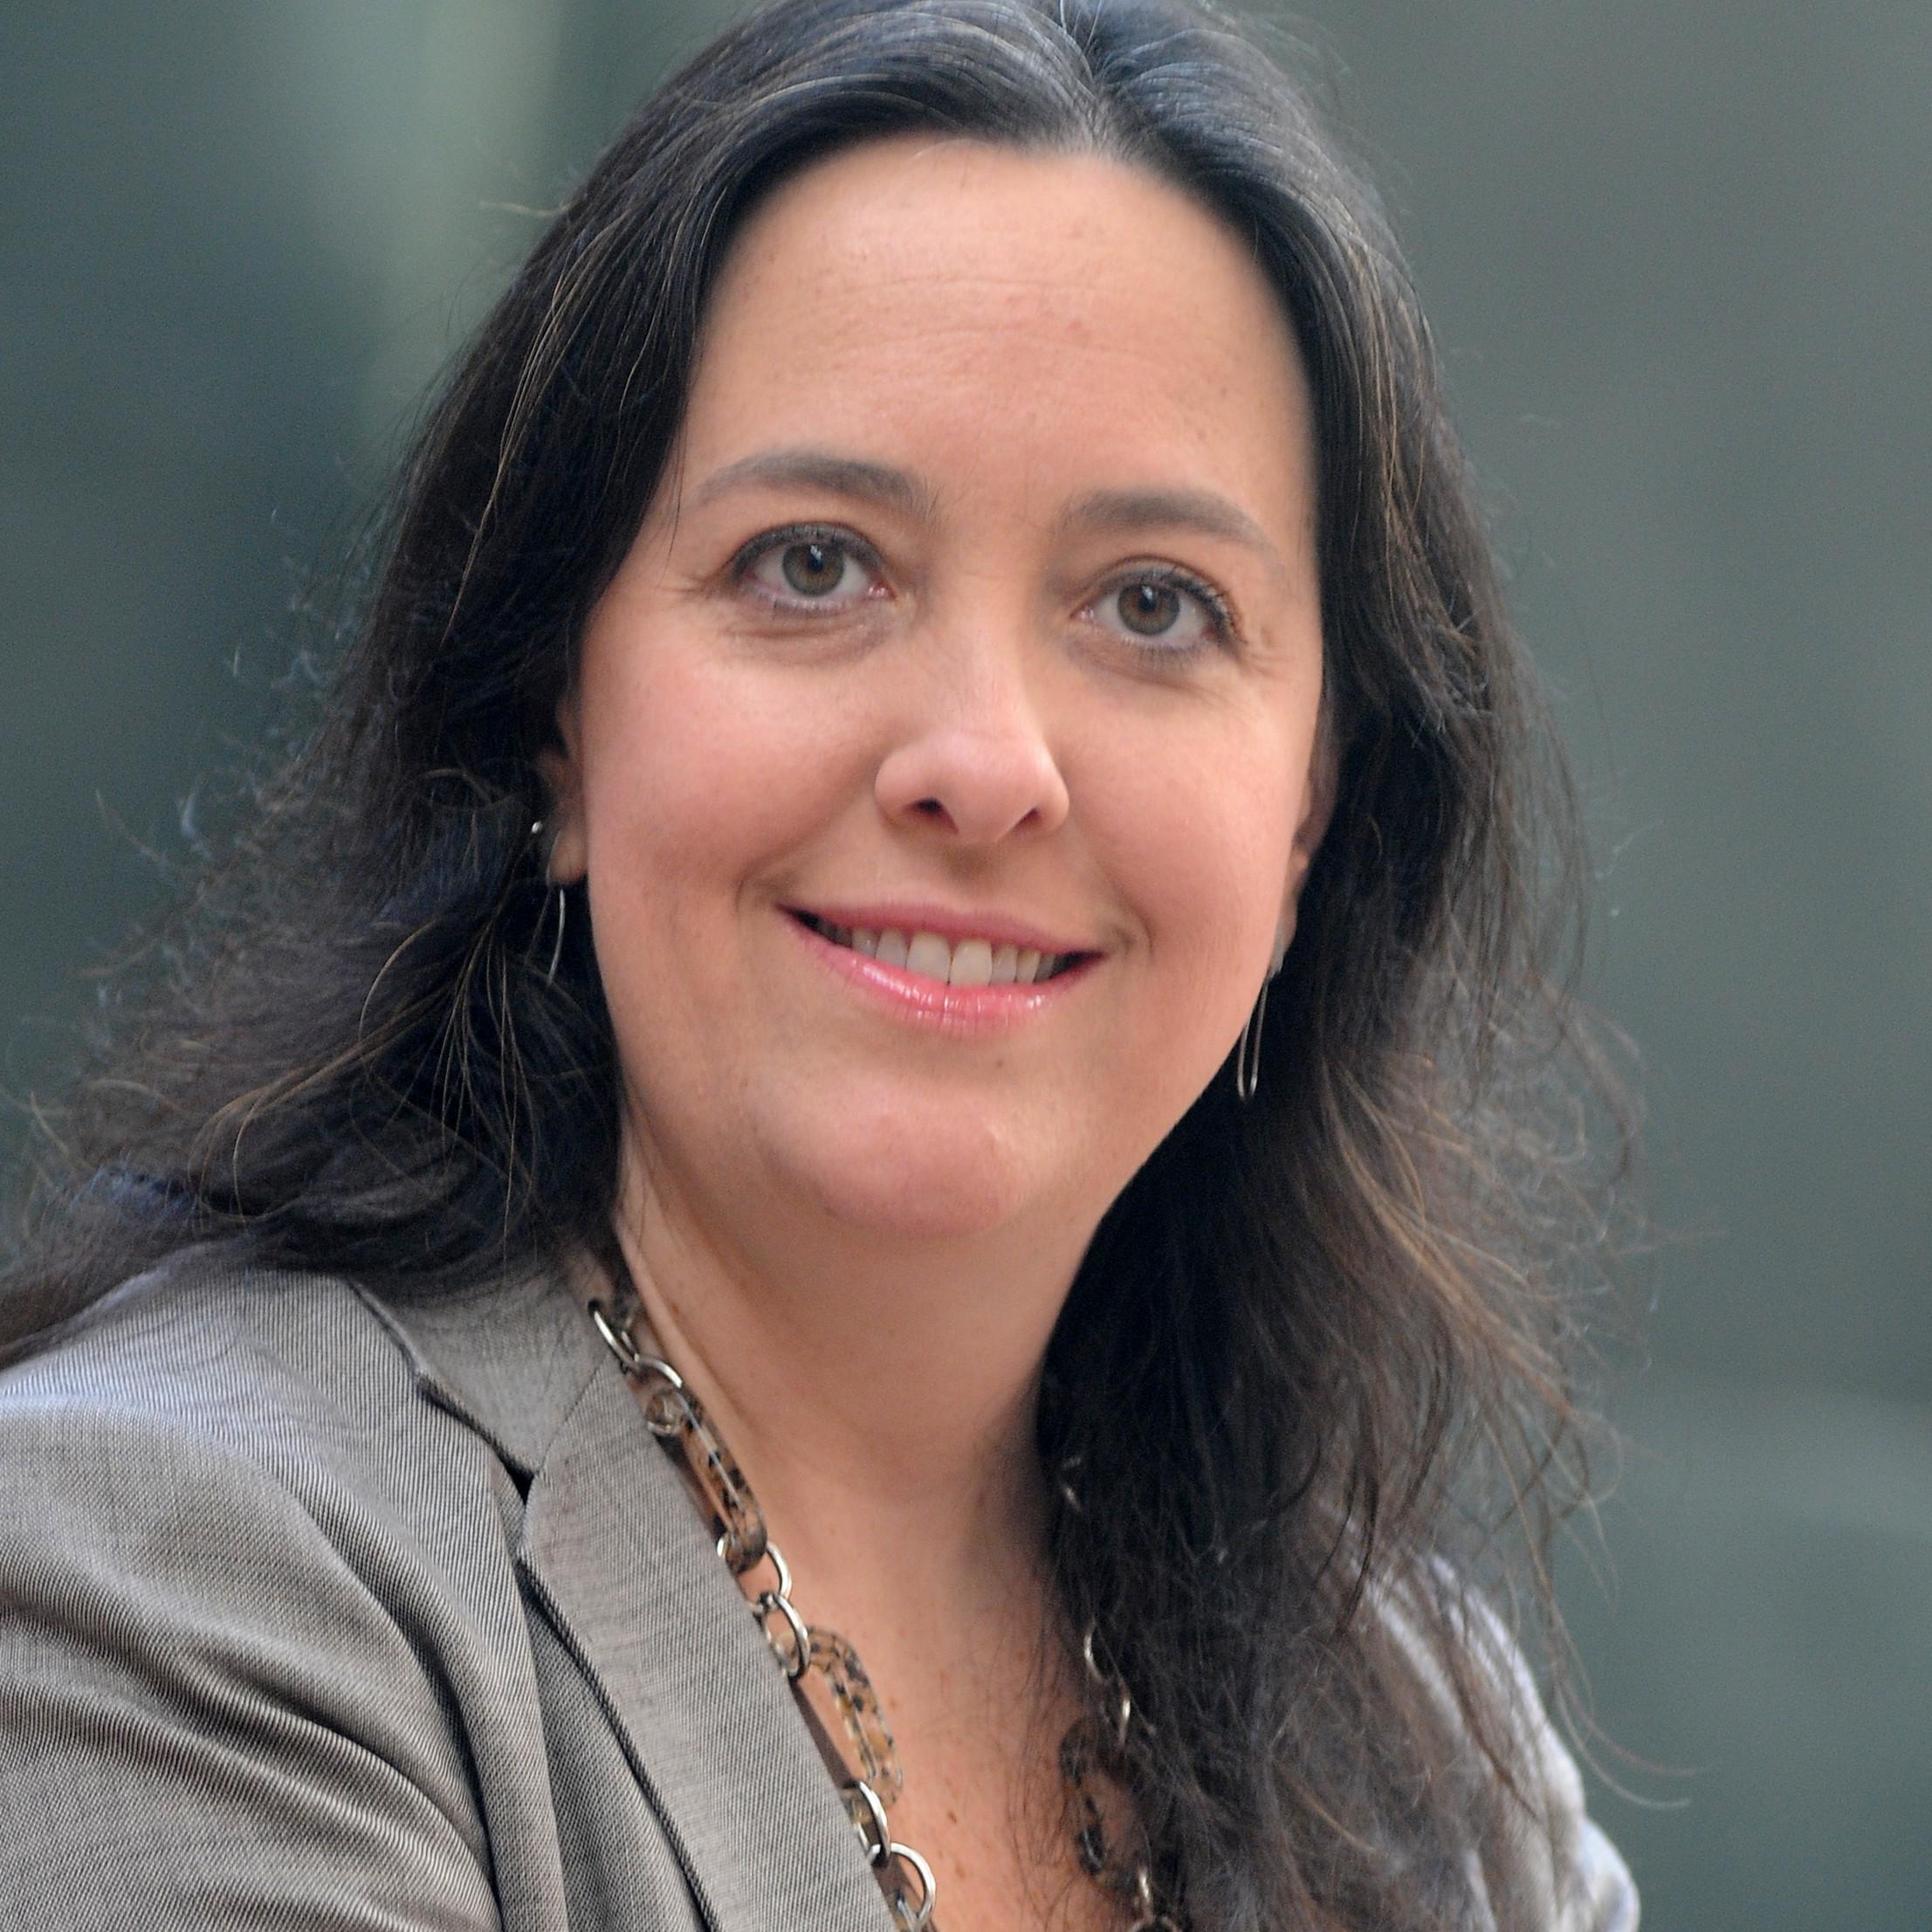 Andrea Pinotti